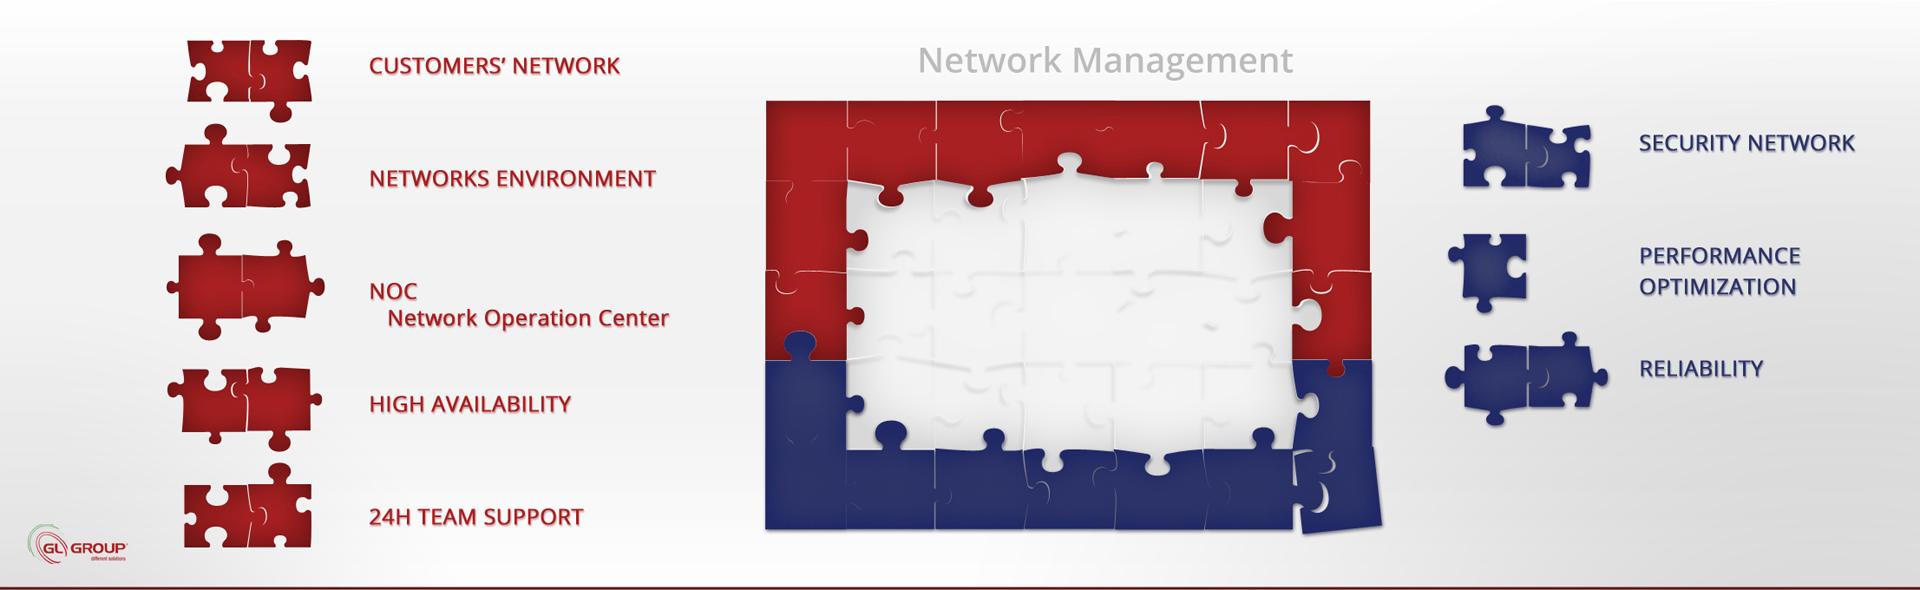 GL Group, Network Management